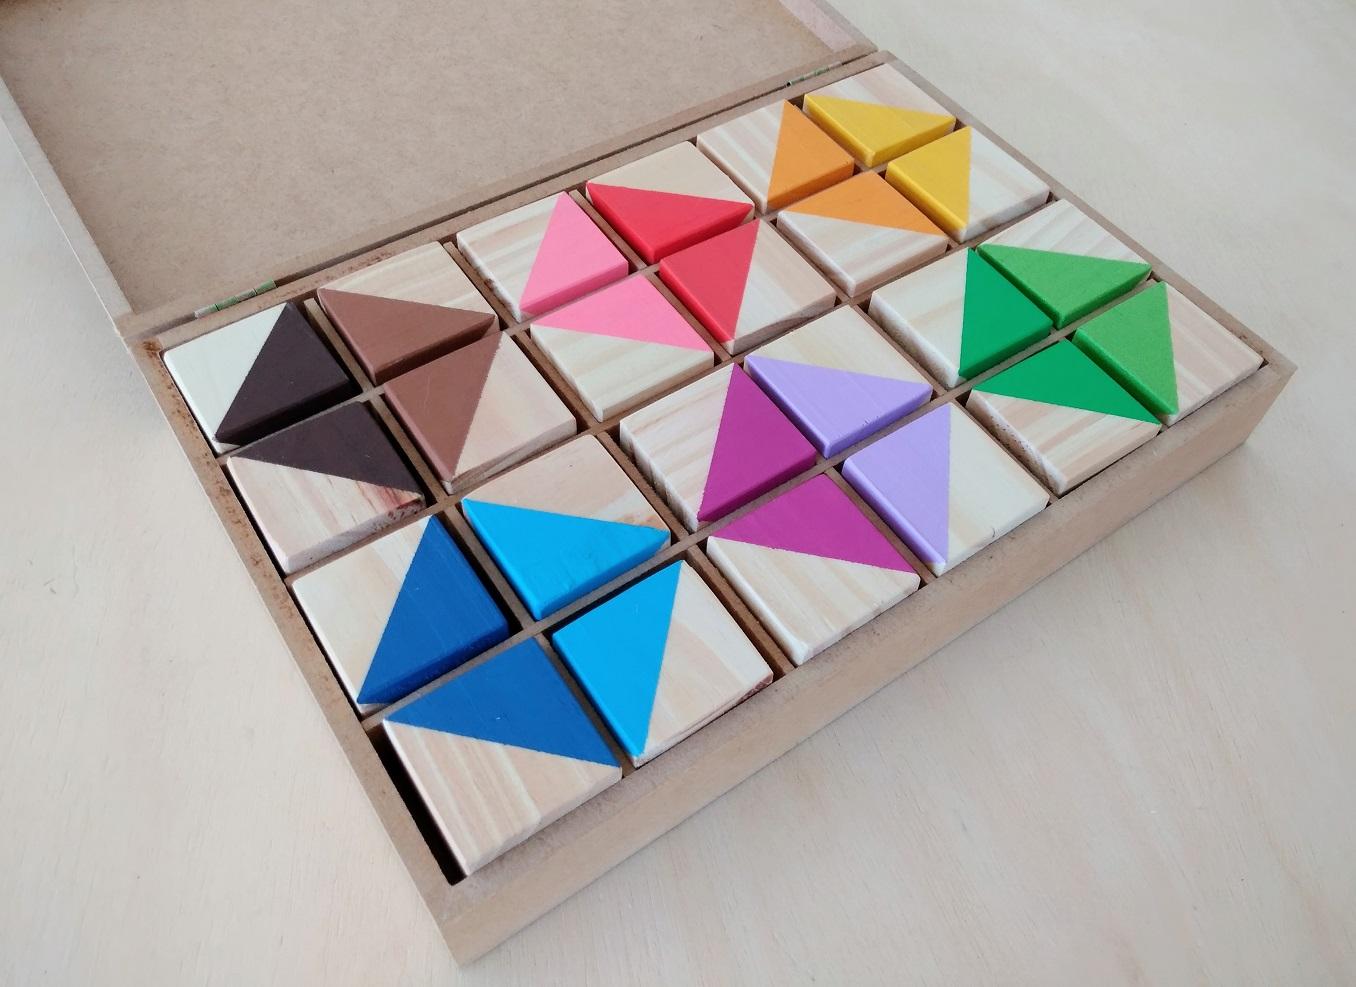 Segunda Caixa de Cores Montessori (similar), com 24 Cubos Coloridos, da Cute Cubes - Cód. CC302